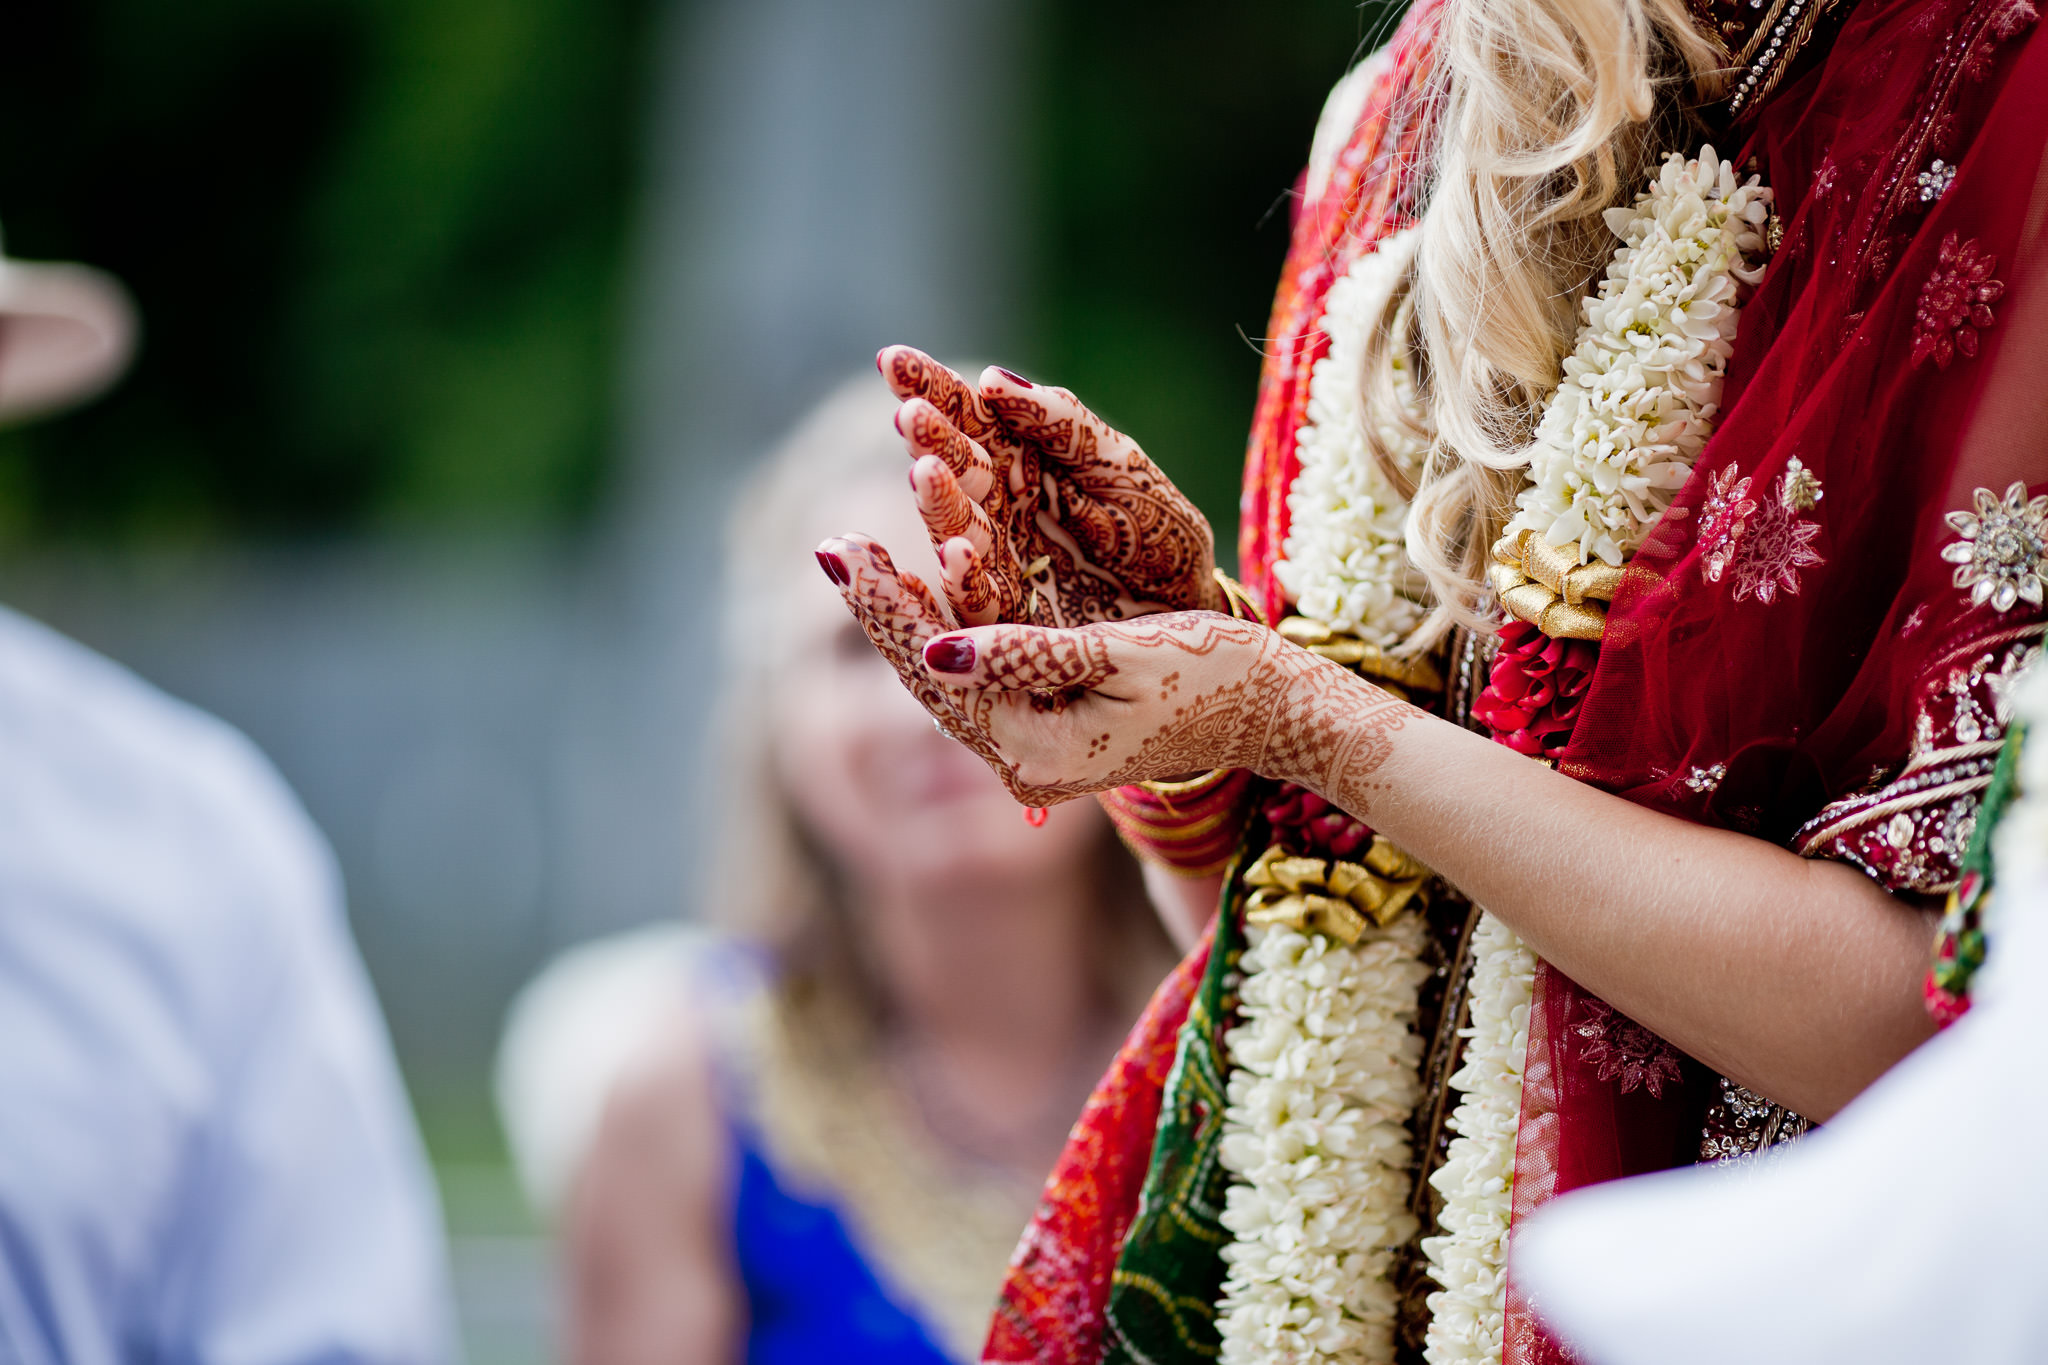 034_Canada-documentary-wedding-photograp